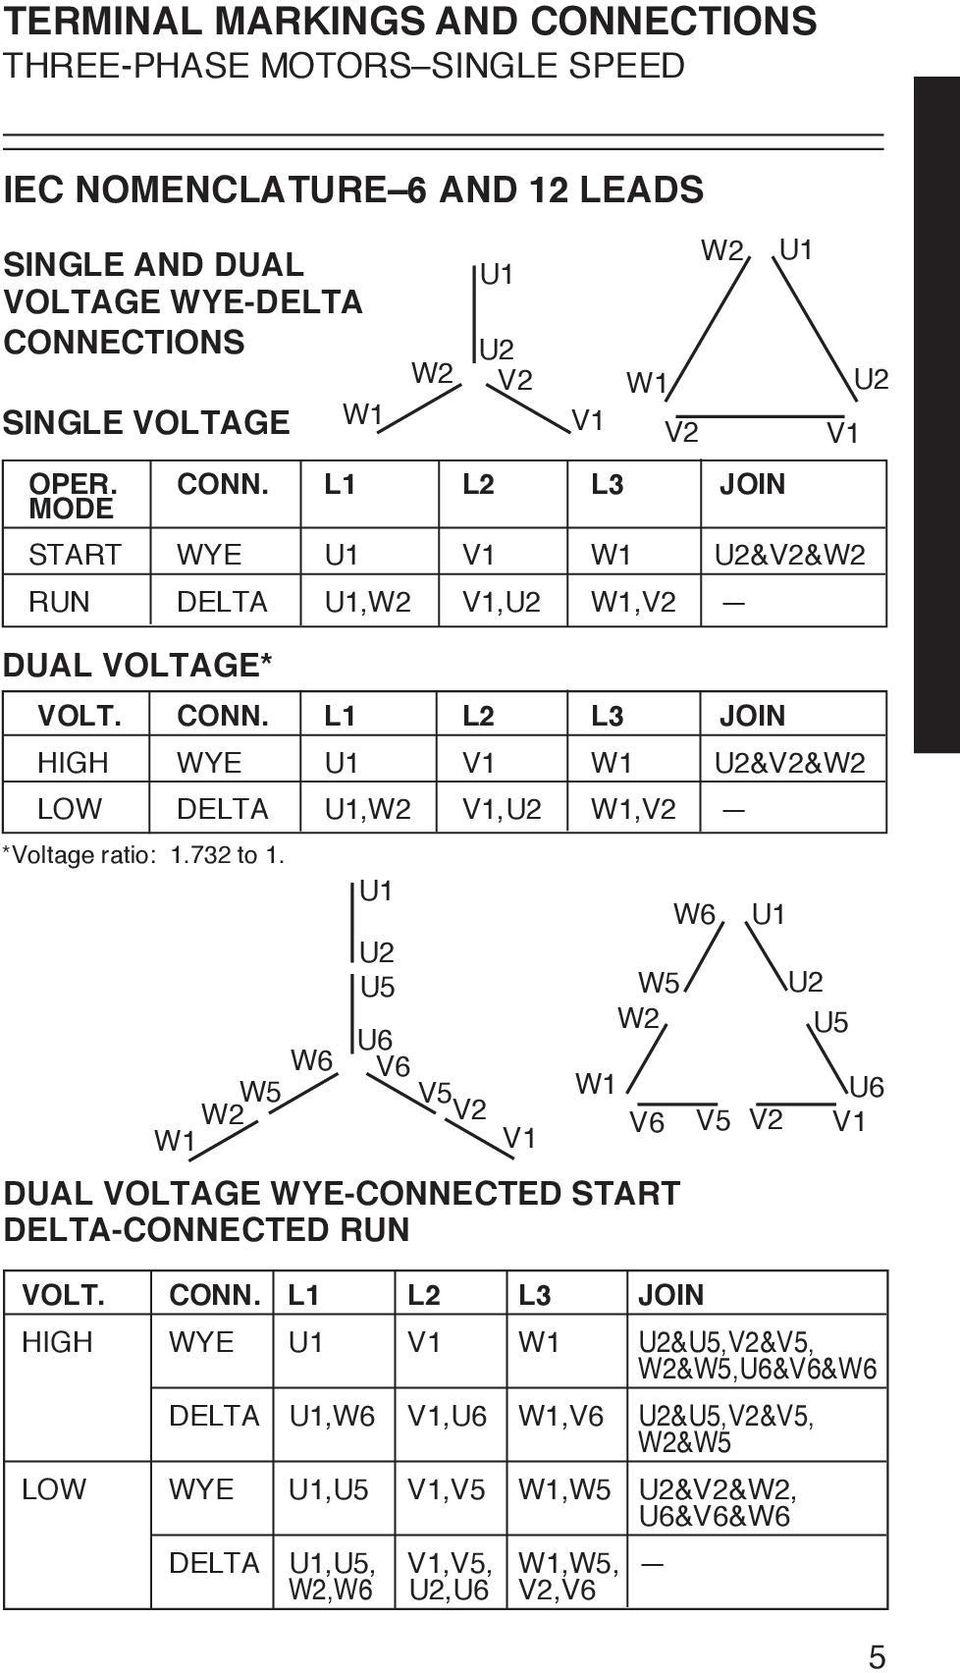 12 Lead Motor Wiring Diagram Iec | Manual E-Books - 3 Phase Motor Wiring Diagram 12 Leads